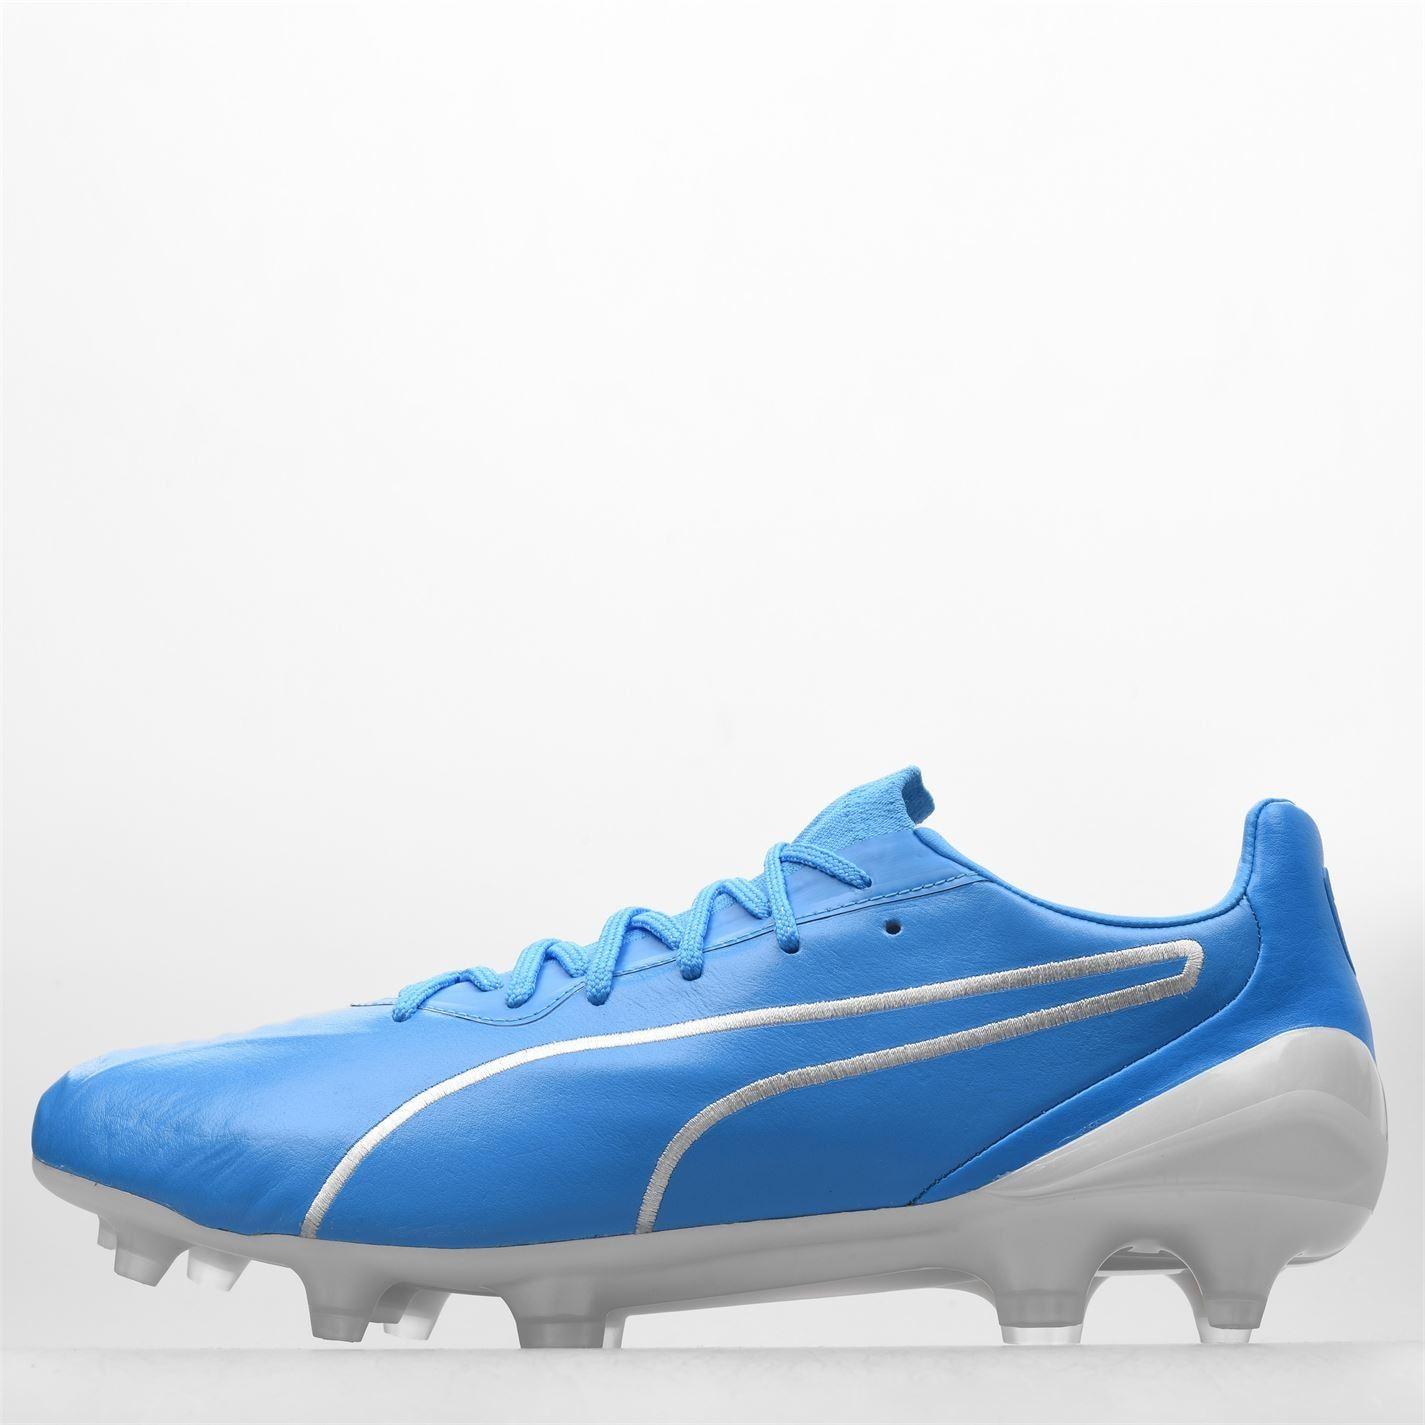 miniature 3 - Puma-King-FG-Firm-Ground-Football-Bottes-Homme-Chaussures-De-Foot-Crampons-Baskets